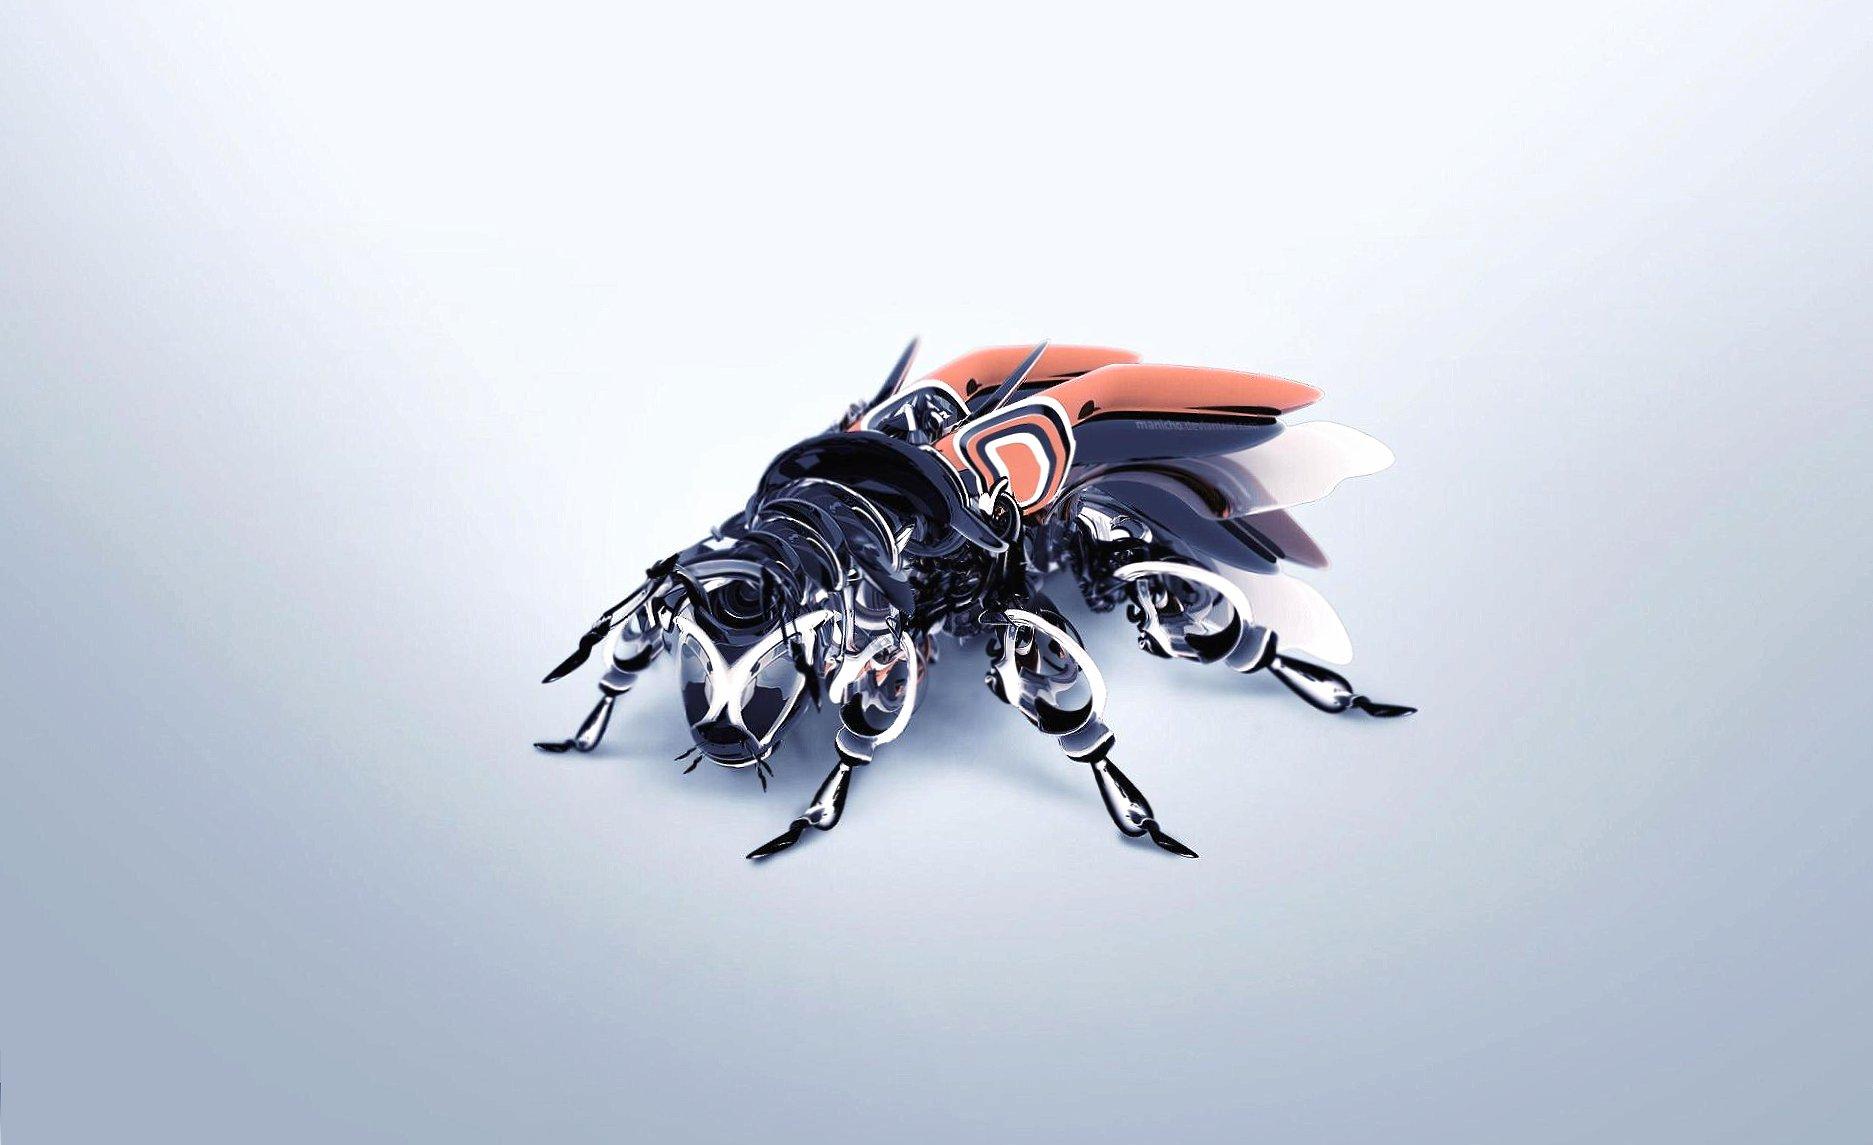 Fly robot 3d digital art wallpapers HD quality